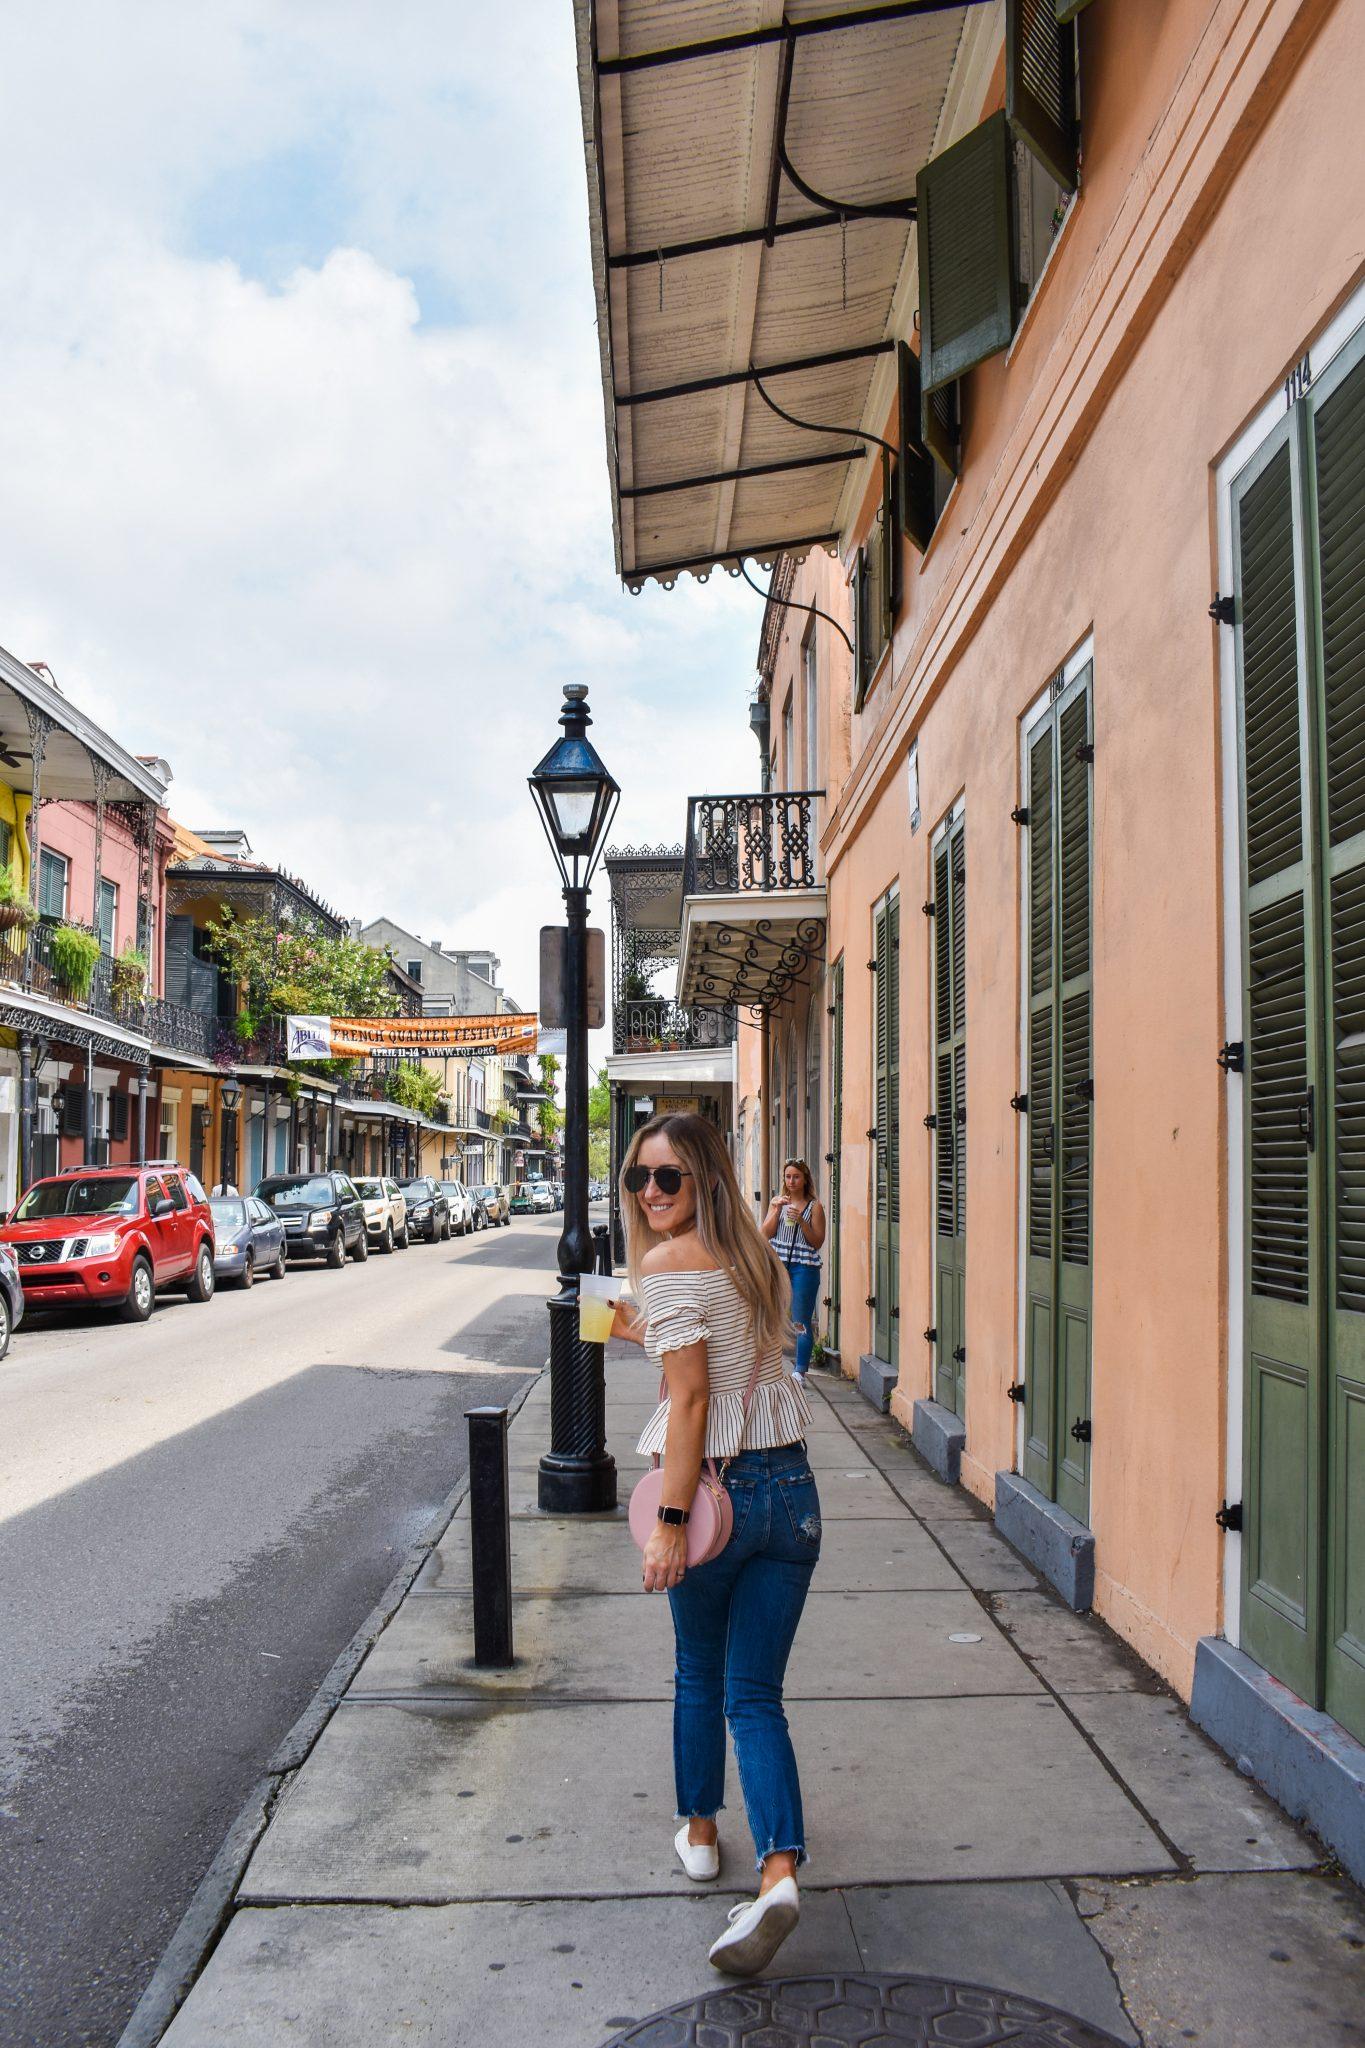 5 Must Explore NEighborhoods in New Orleans